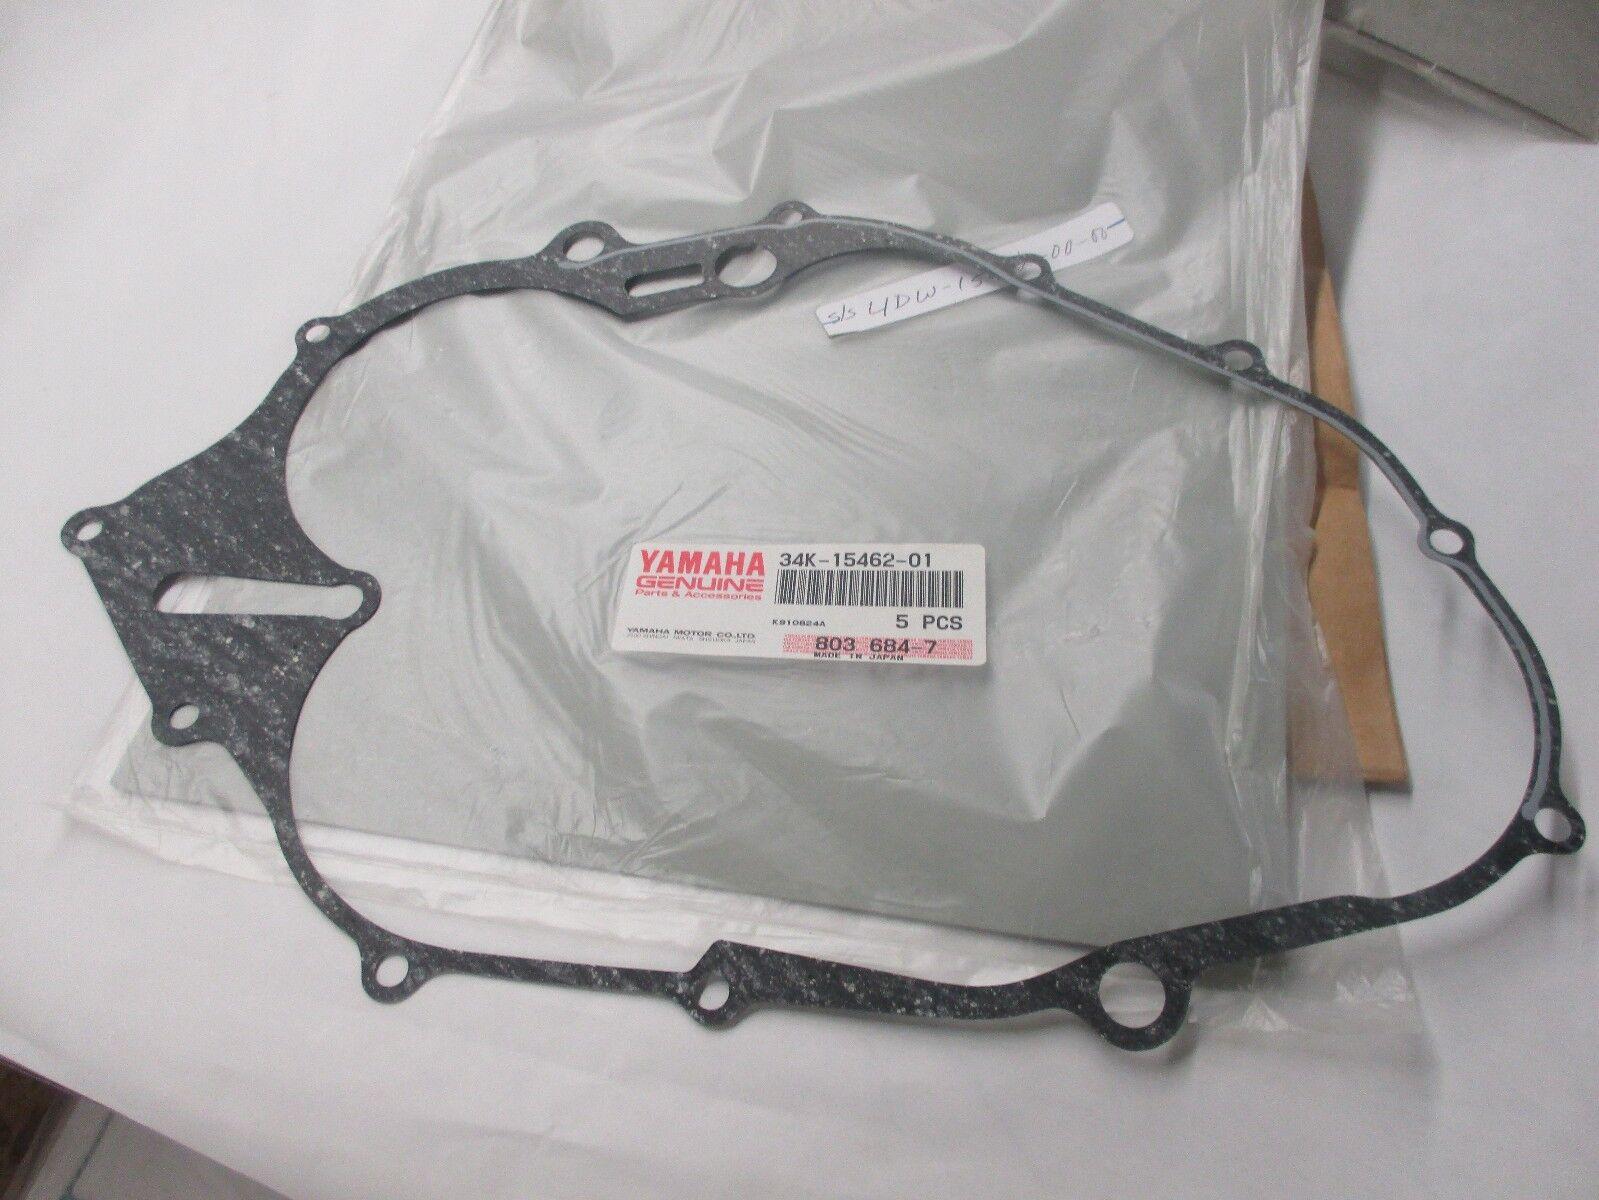 NOS Yamaha 1991-1992 XT600 Crankcase Gasket 3 34K-15462-01